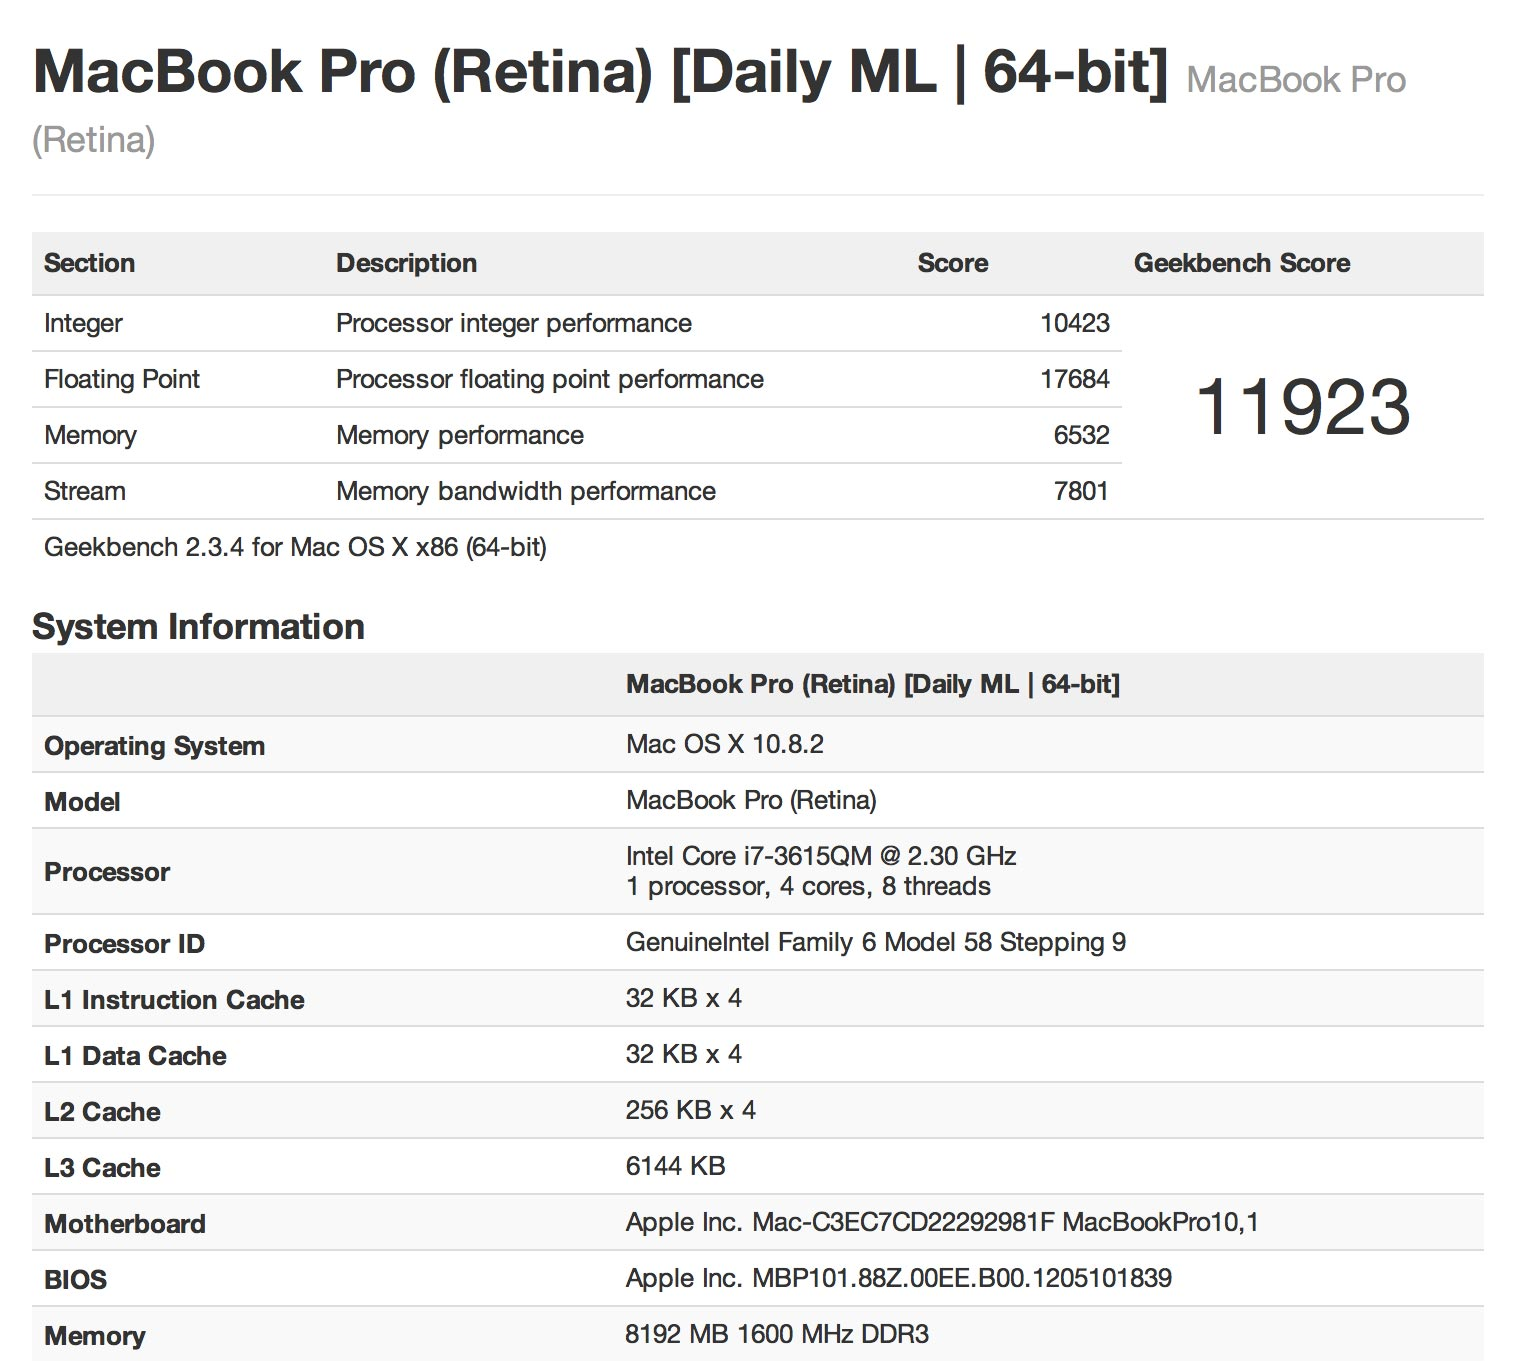 инструкция к macbook pro ретина на русском